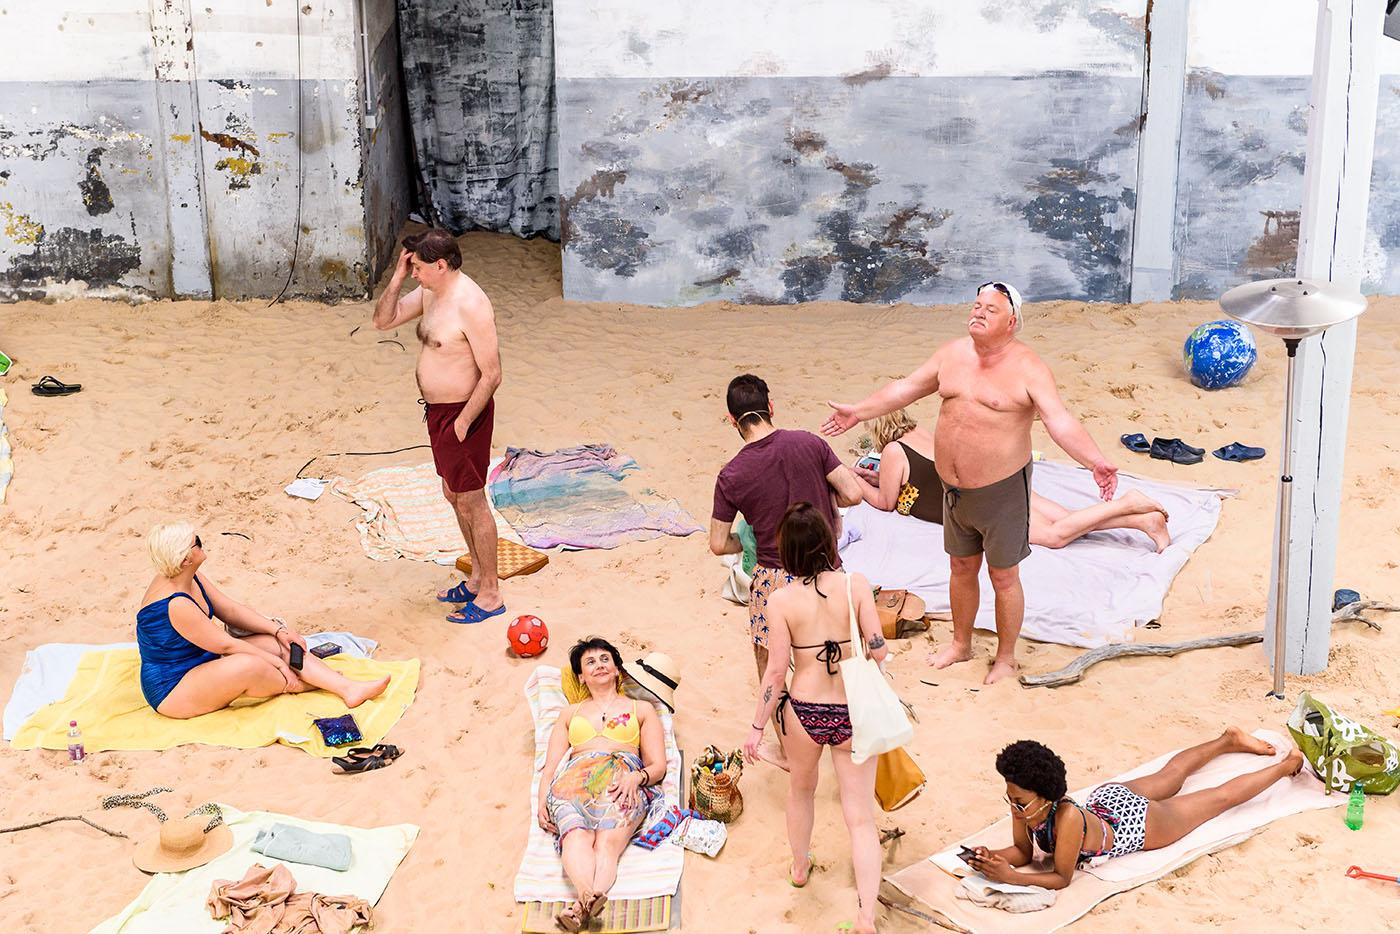 "Rugilė Barzdžiukaitė, Vaiva Grainytė and Lina Lapelytė, ""Sun & Sea (Marina)."" Exhibition view at Lithuania Pavilion, 58th Venice Biennale, 2019. Photography by Andrea Avezzù. Courtesy of the artists and Venice Biennale."